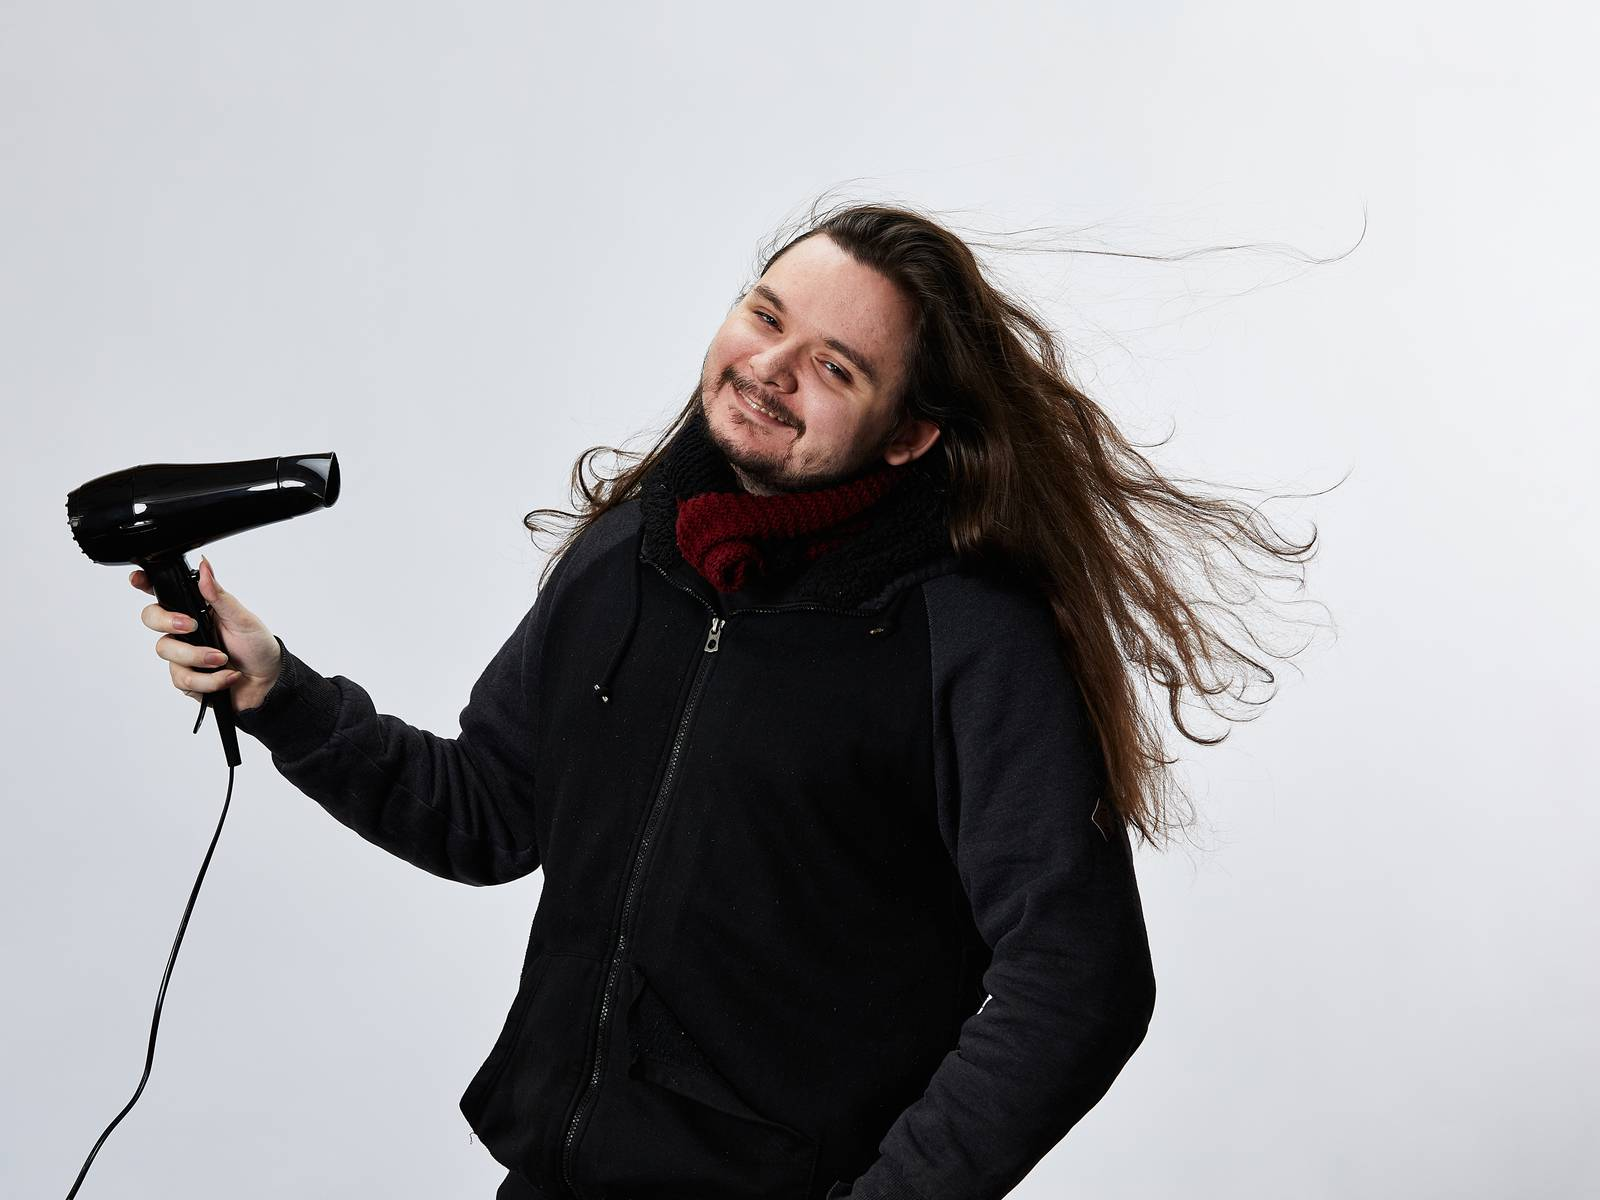 Calin blowdrying his long, flowing locks of hair